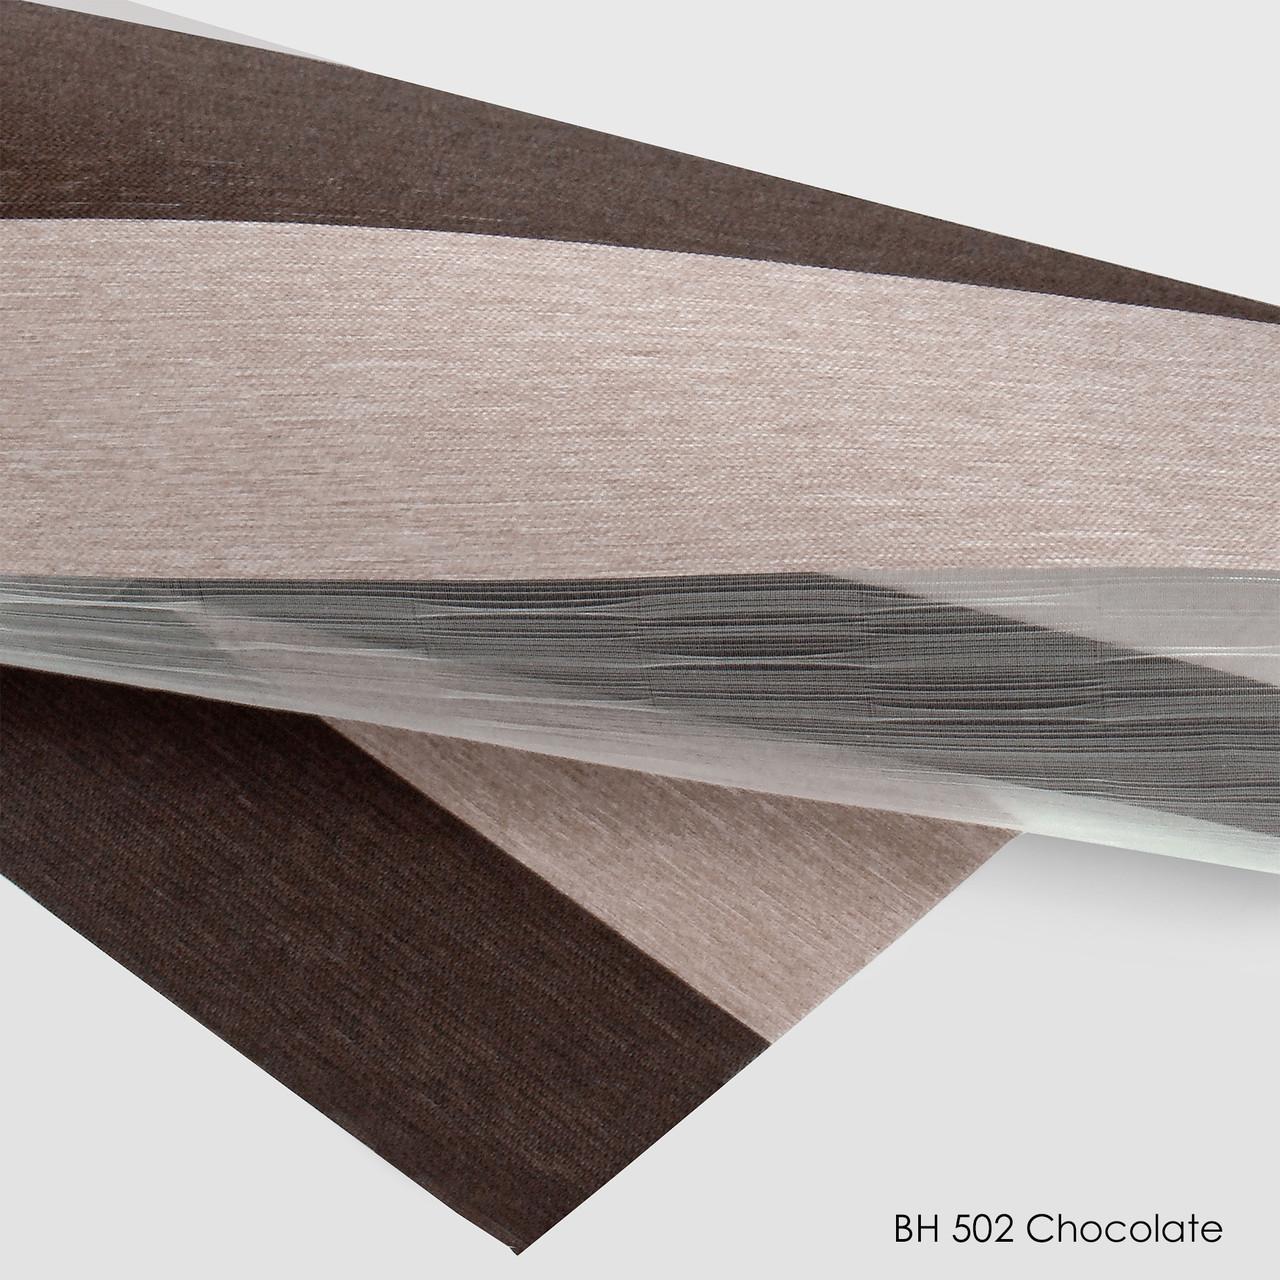 BH-502 chocolate